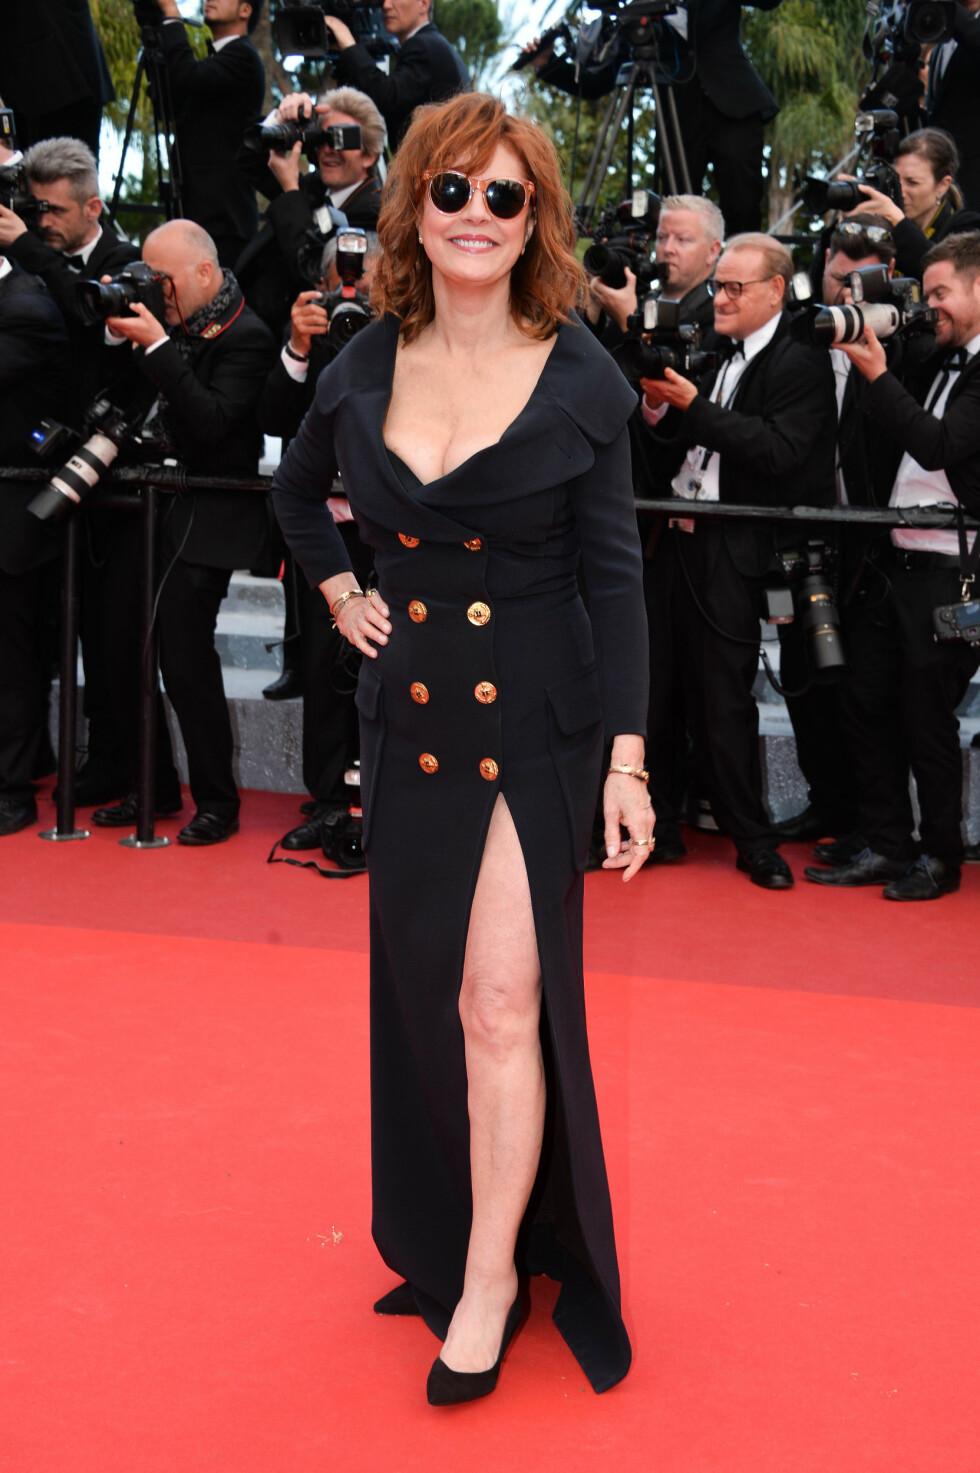 Cannes Film Festival 2016 Foto: Abaca